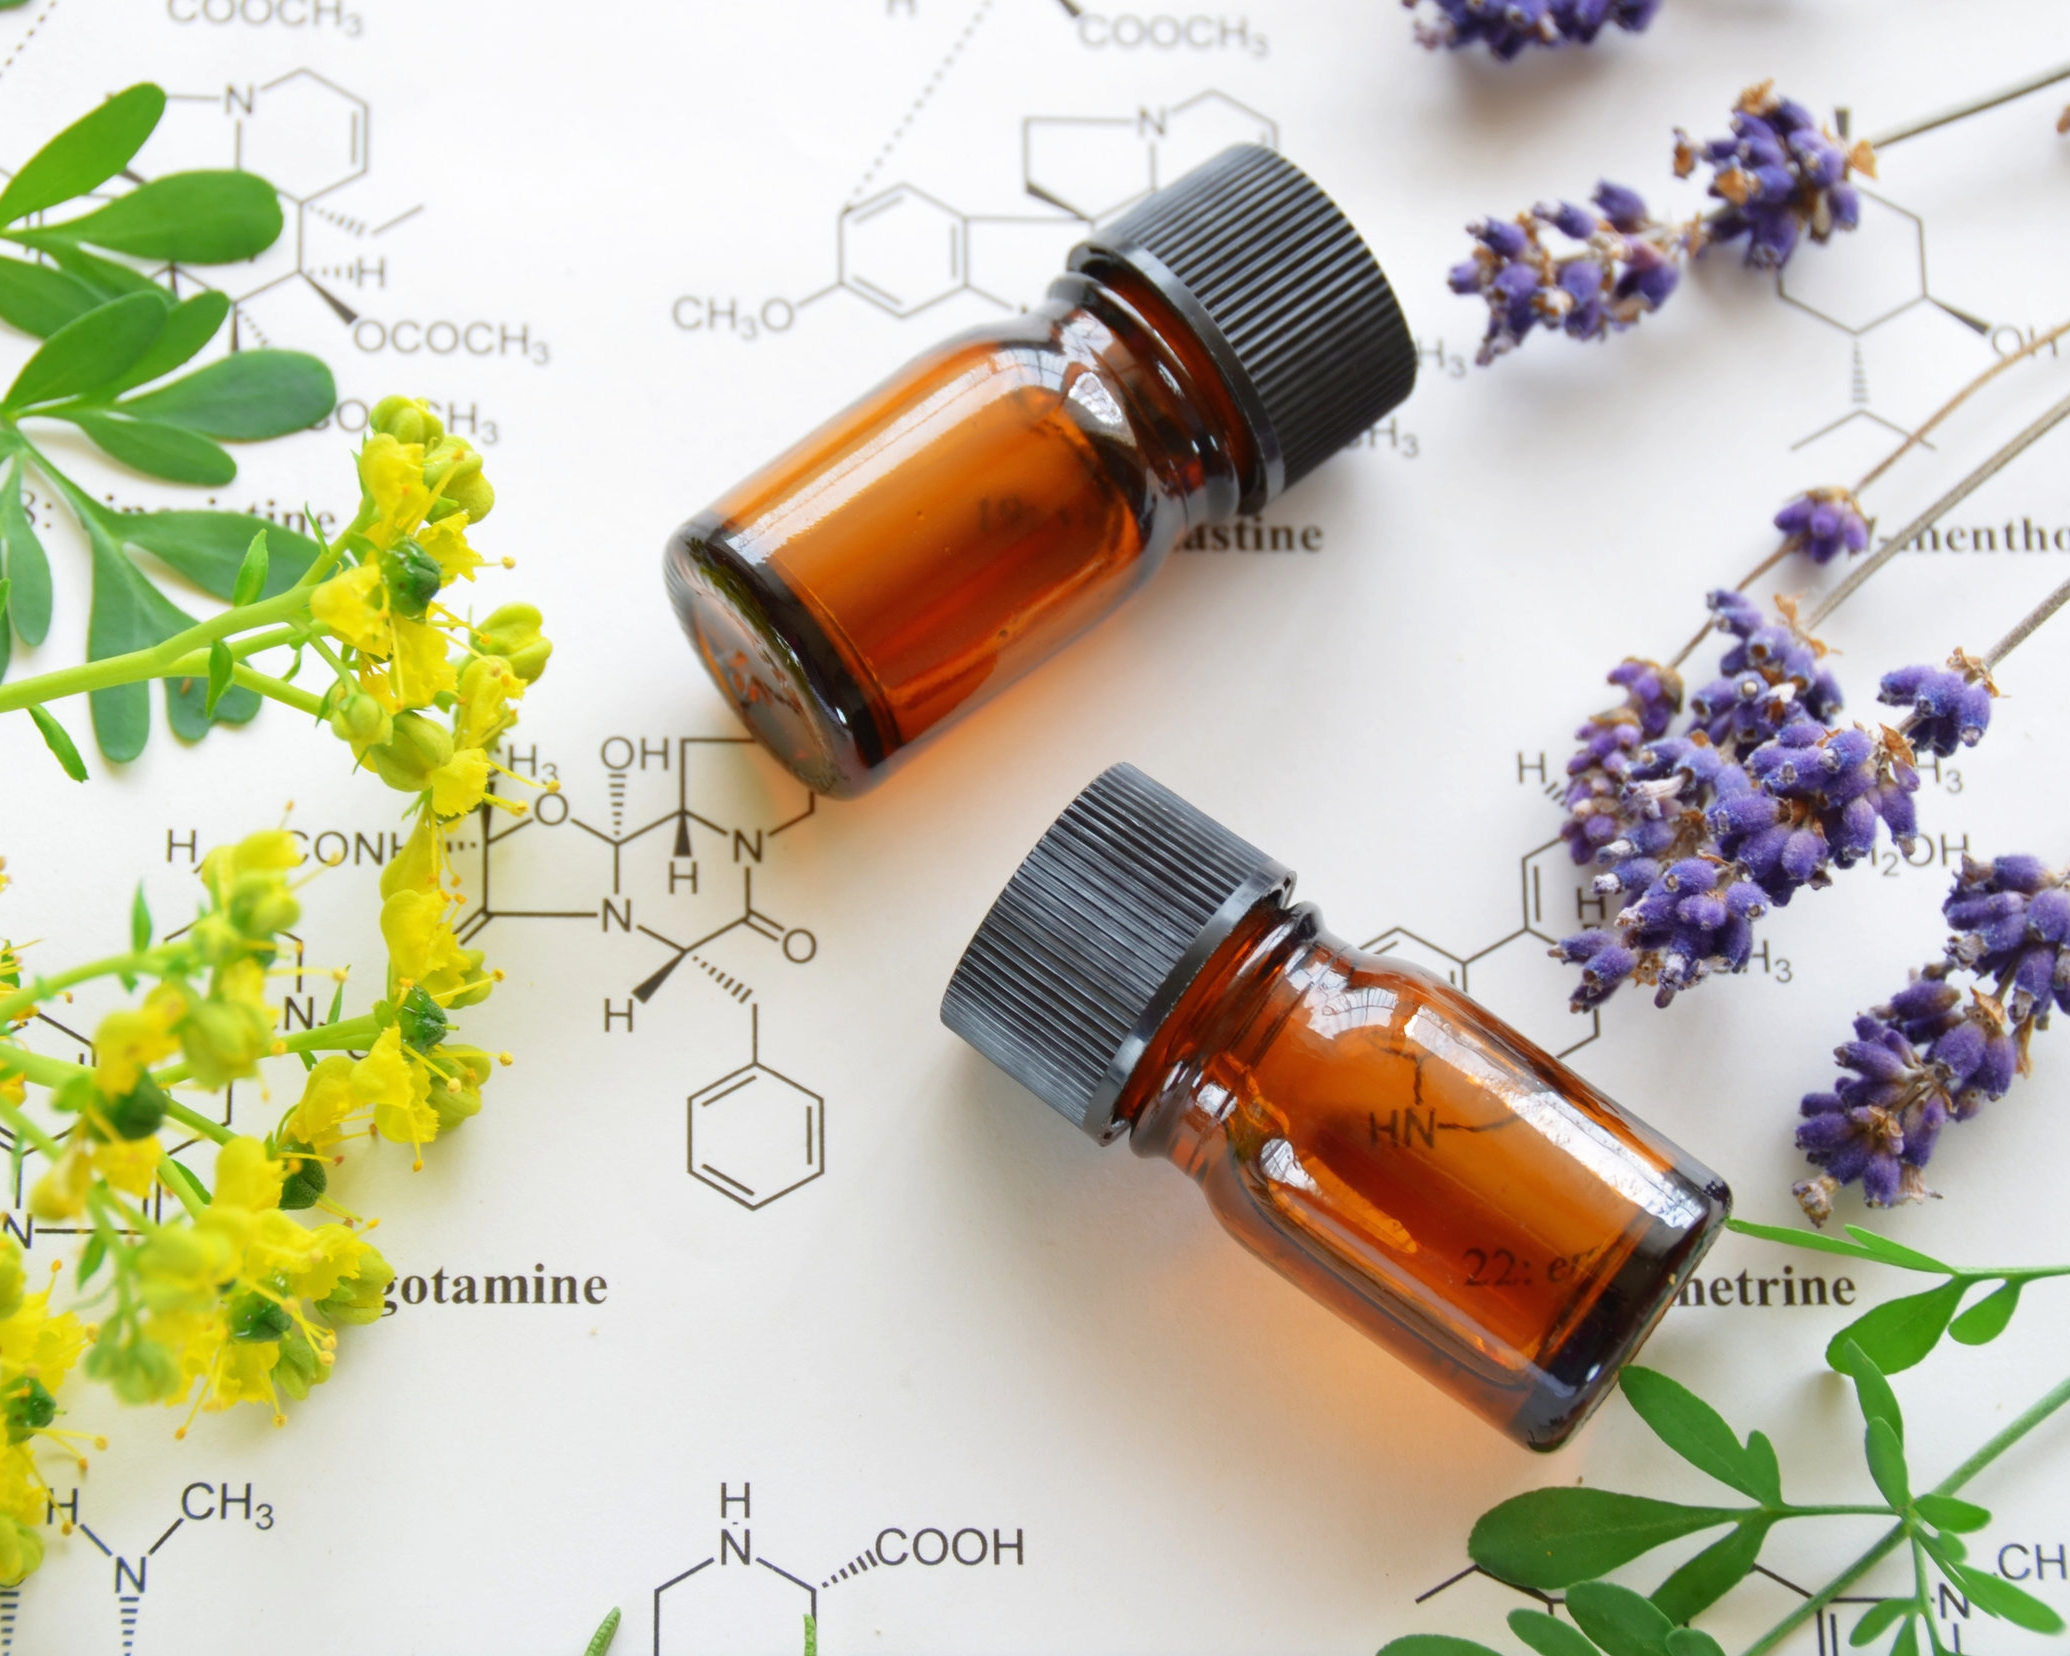 Aromatherapy - Essential oil Massage - Zeina Raya's naturopathic practice